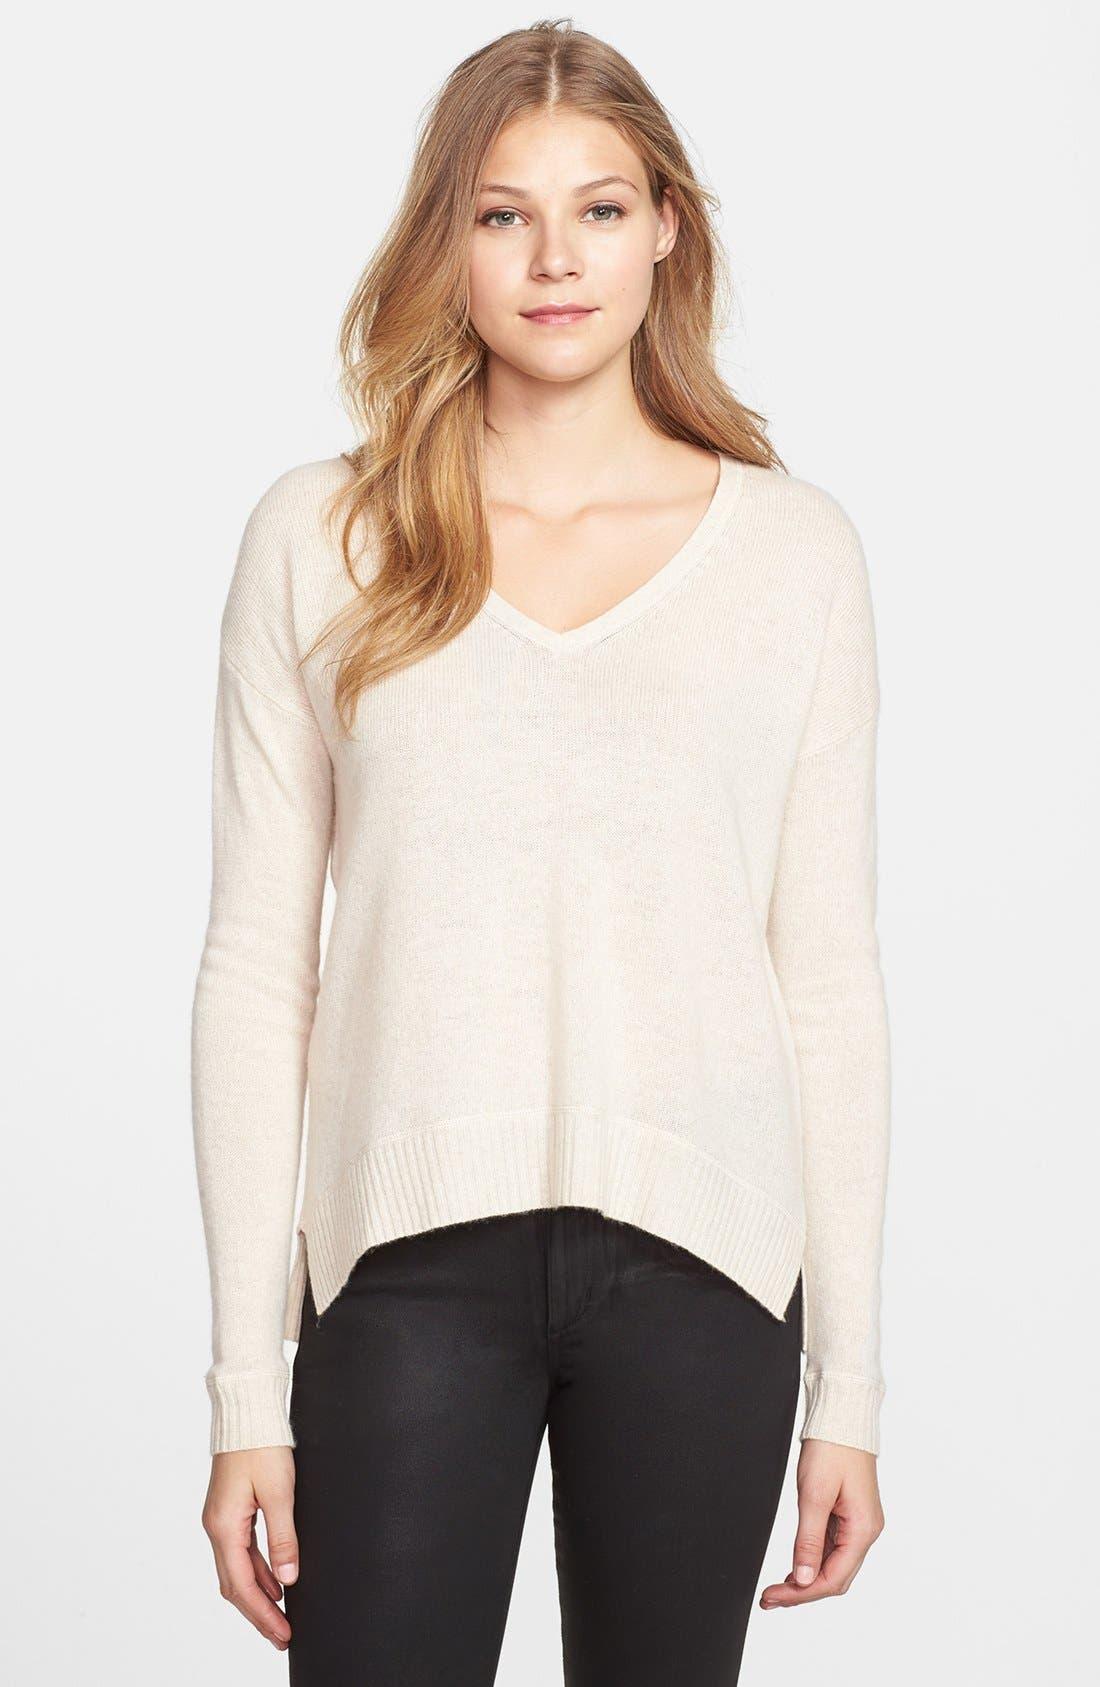 Alternate Image 1 Selected - Halogen® Wool & Cashmere Sweater (Regular & Petite)